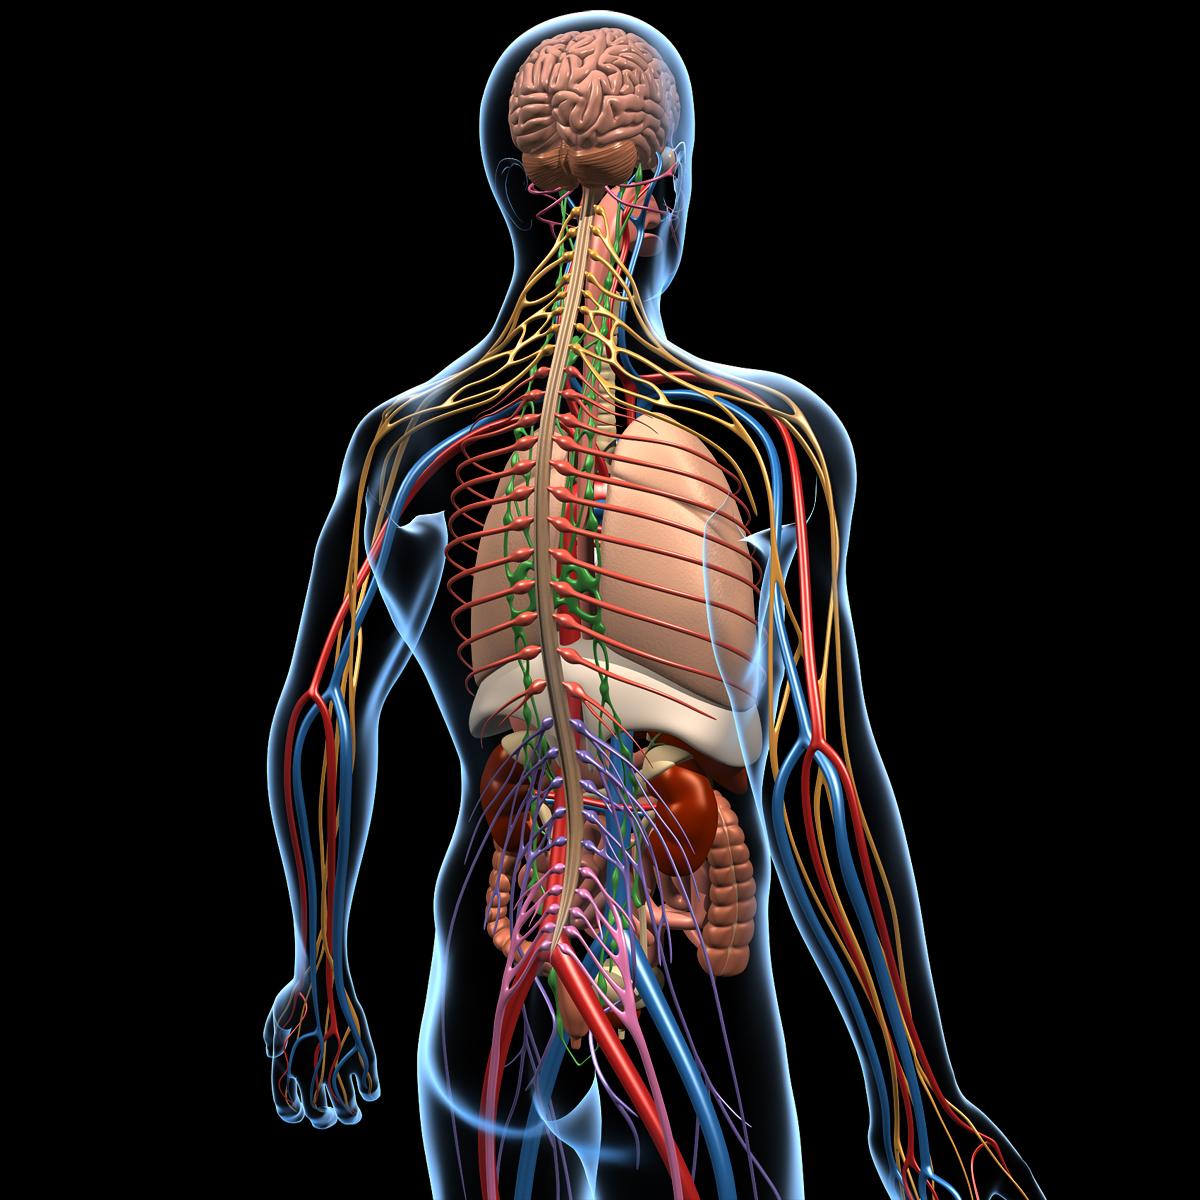 Human Anatomy Brain & Nervous System - MotionCow